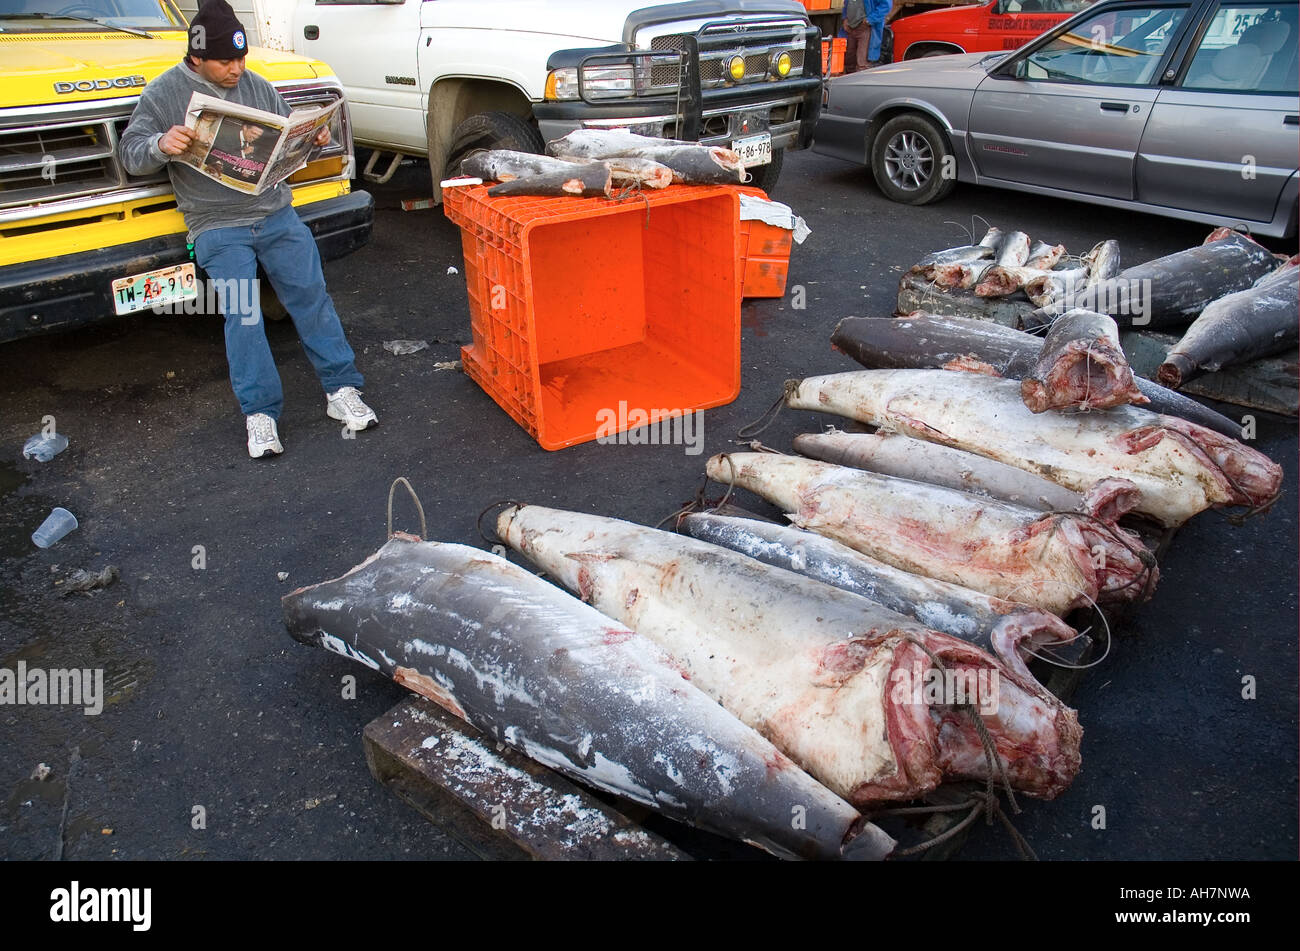 La Viga Mexico City s wholesale fish market Stock Photo: 8220505 - Alamy